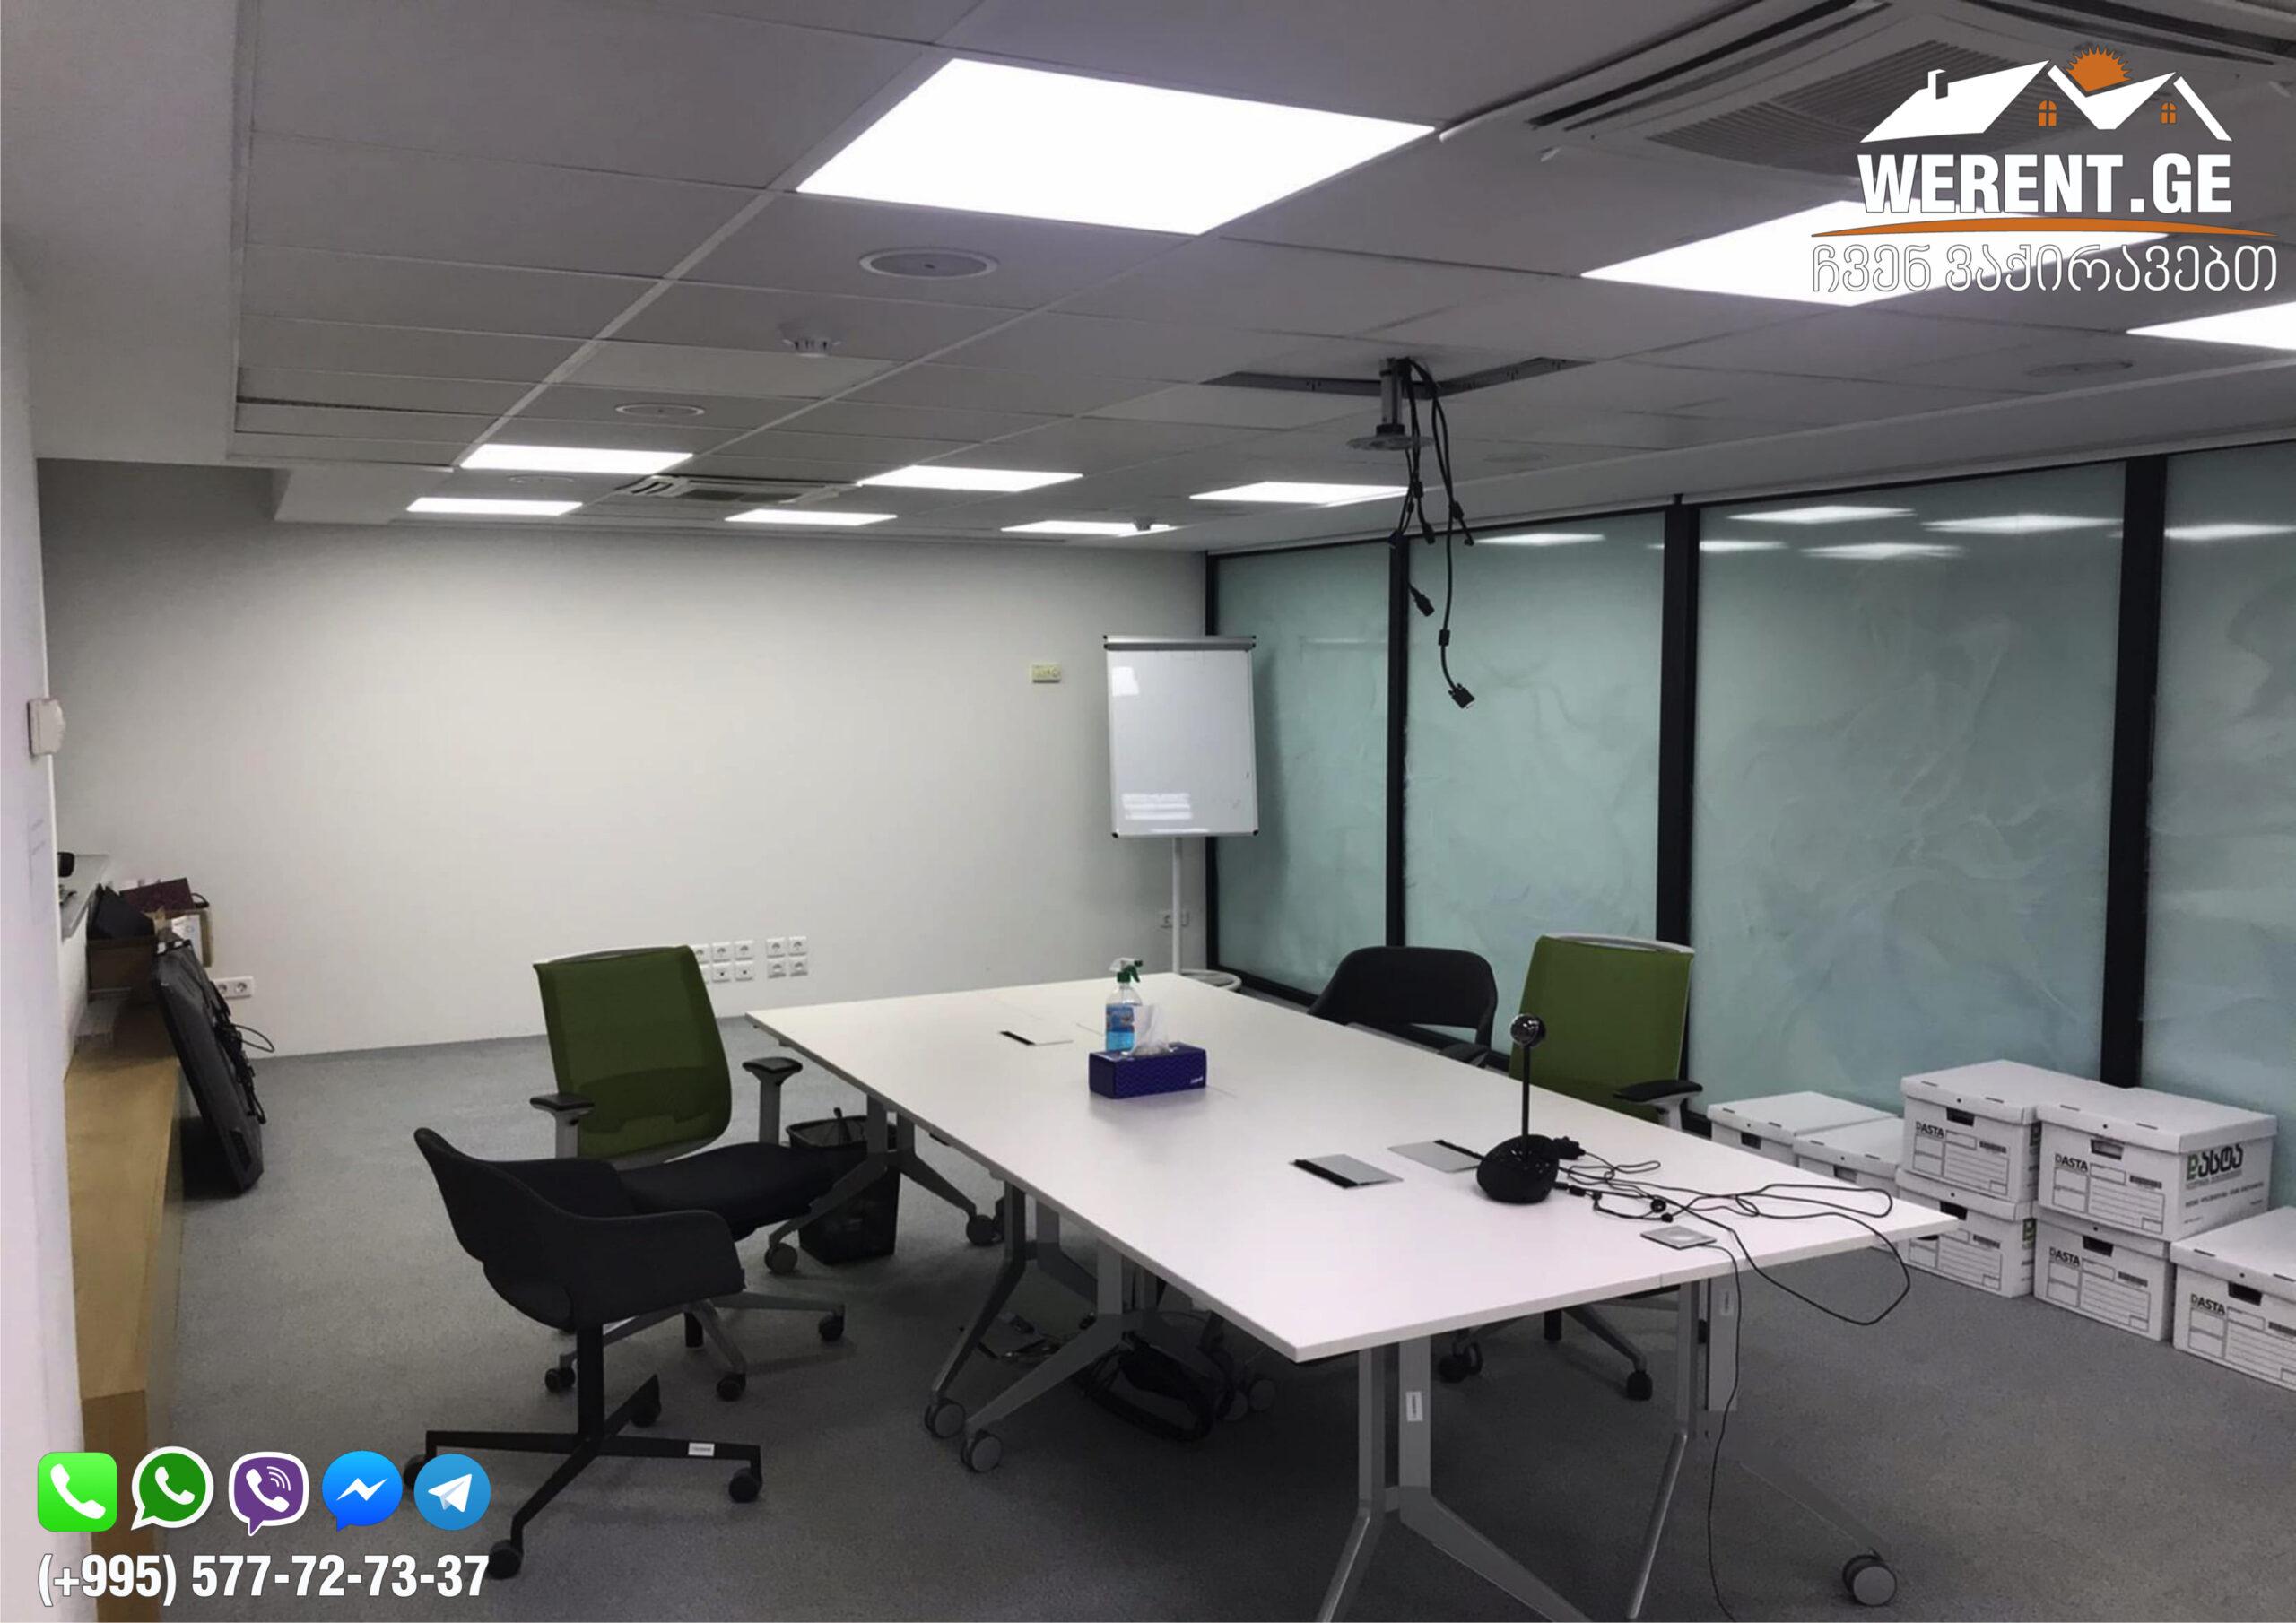 BCV presentation office space 689 sq m-11_wm